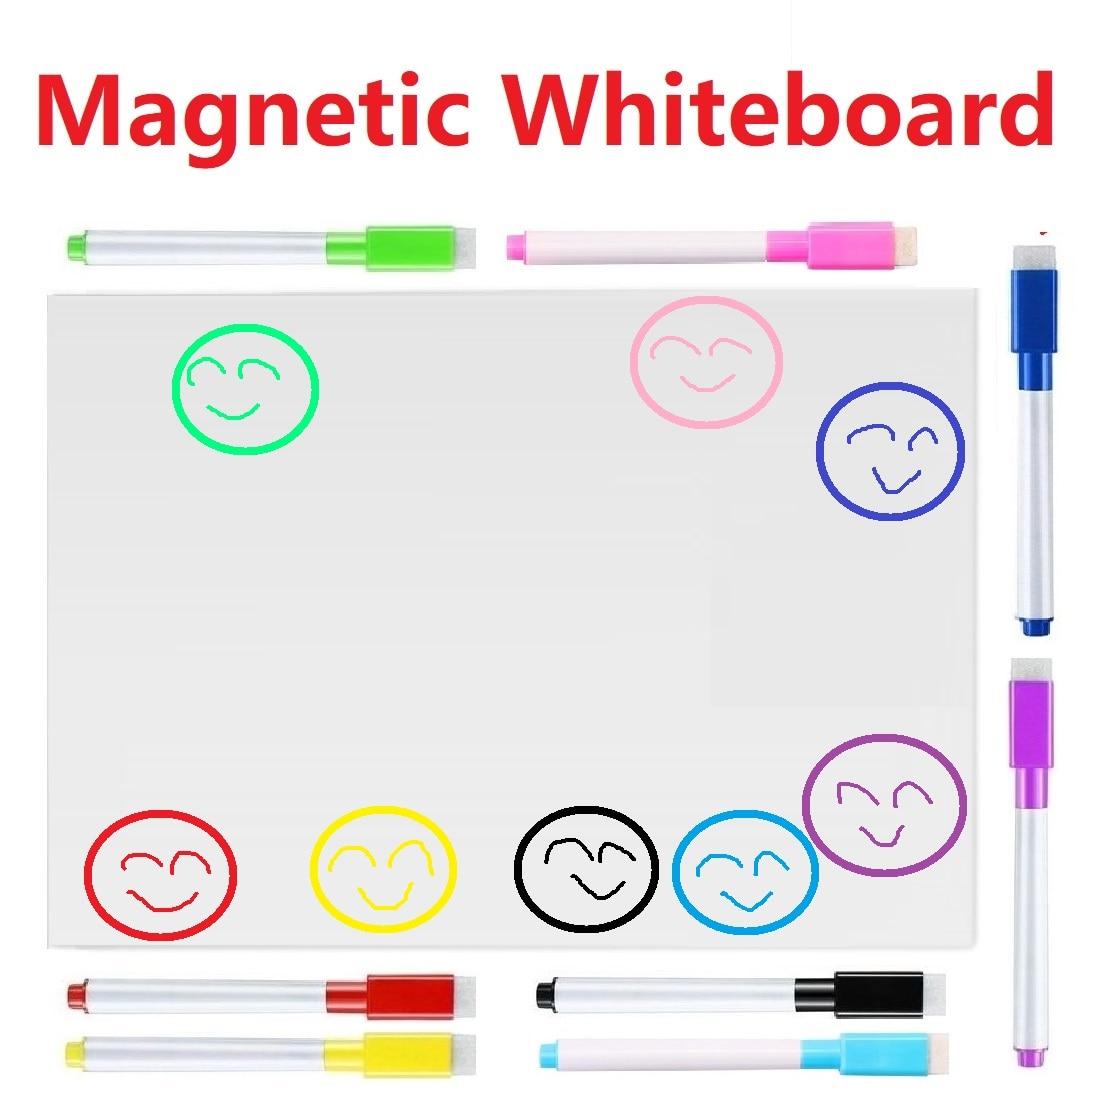 Magnetic White Board For Fridge Refrigerator Magnets White Board Markers Eraser Magnet Board Memo Boards Whiteboard For Kids